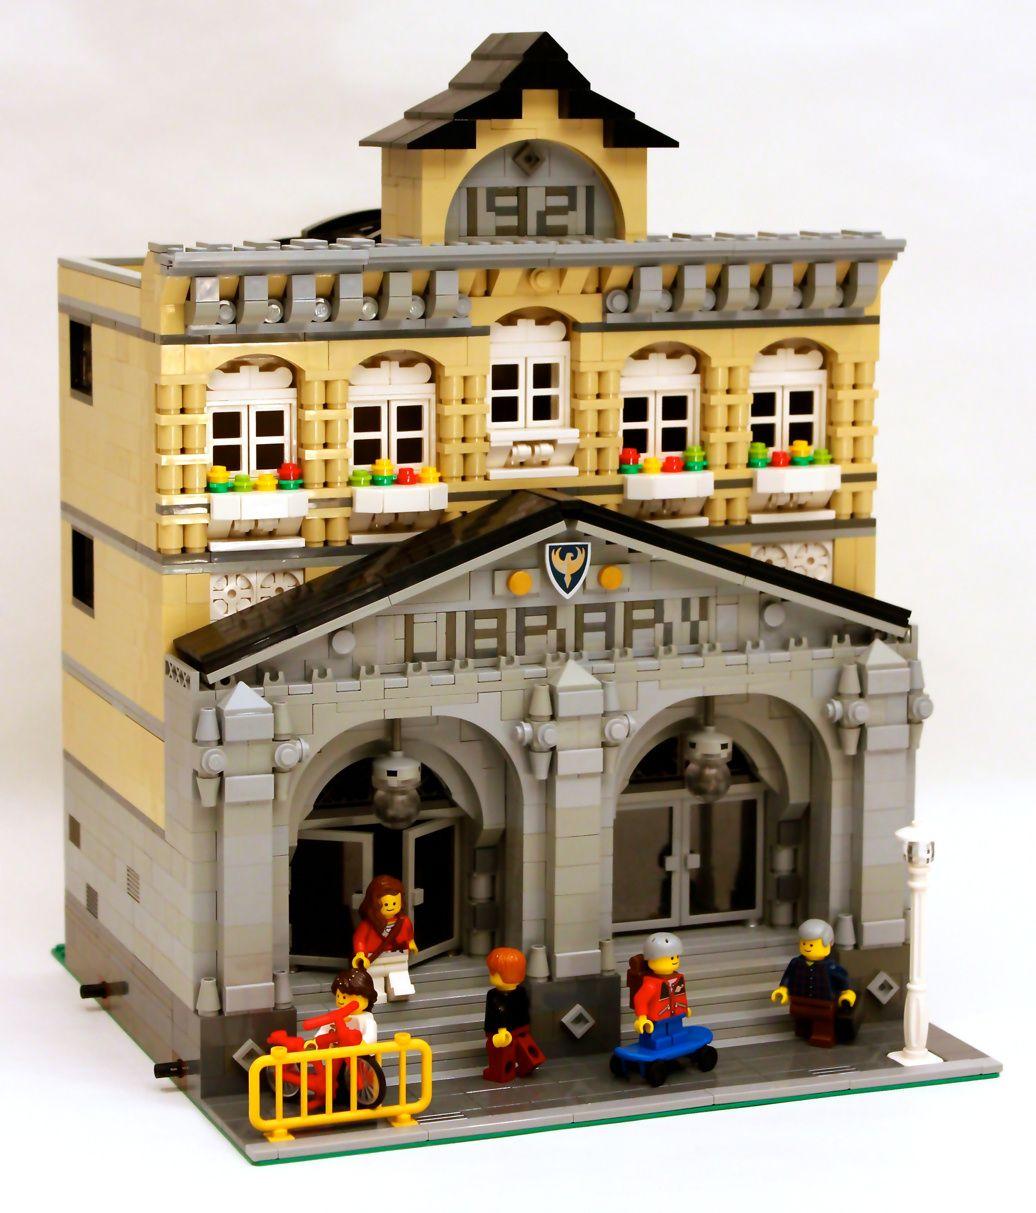 modular library lego lego modular lego lego building. Black Bedroom Furniture Sets. Home Design Ideas